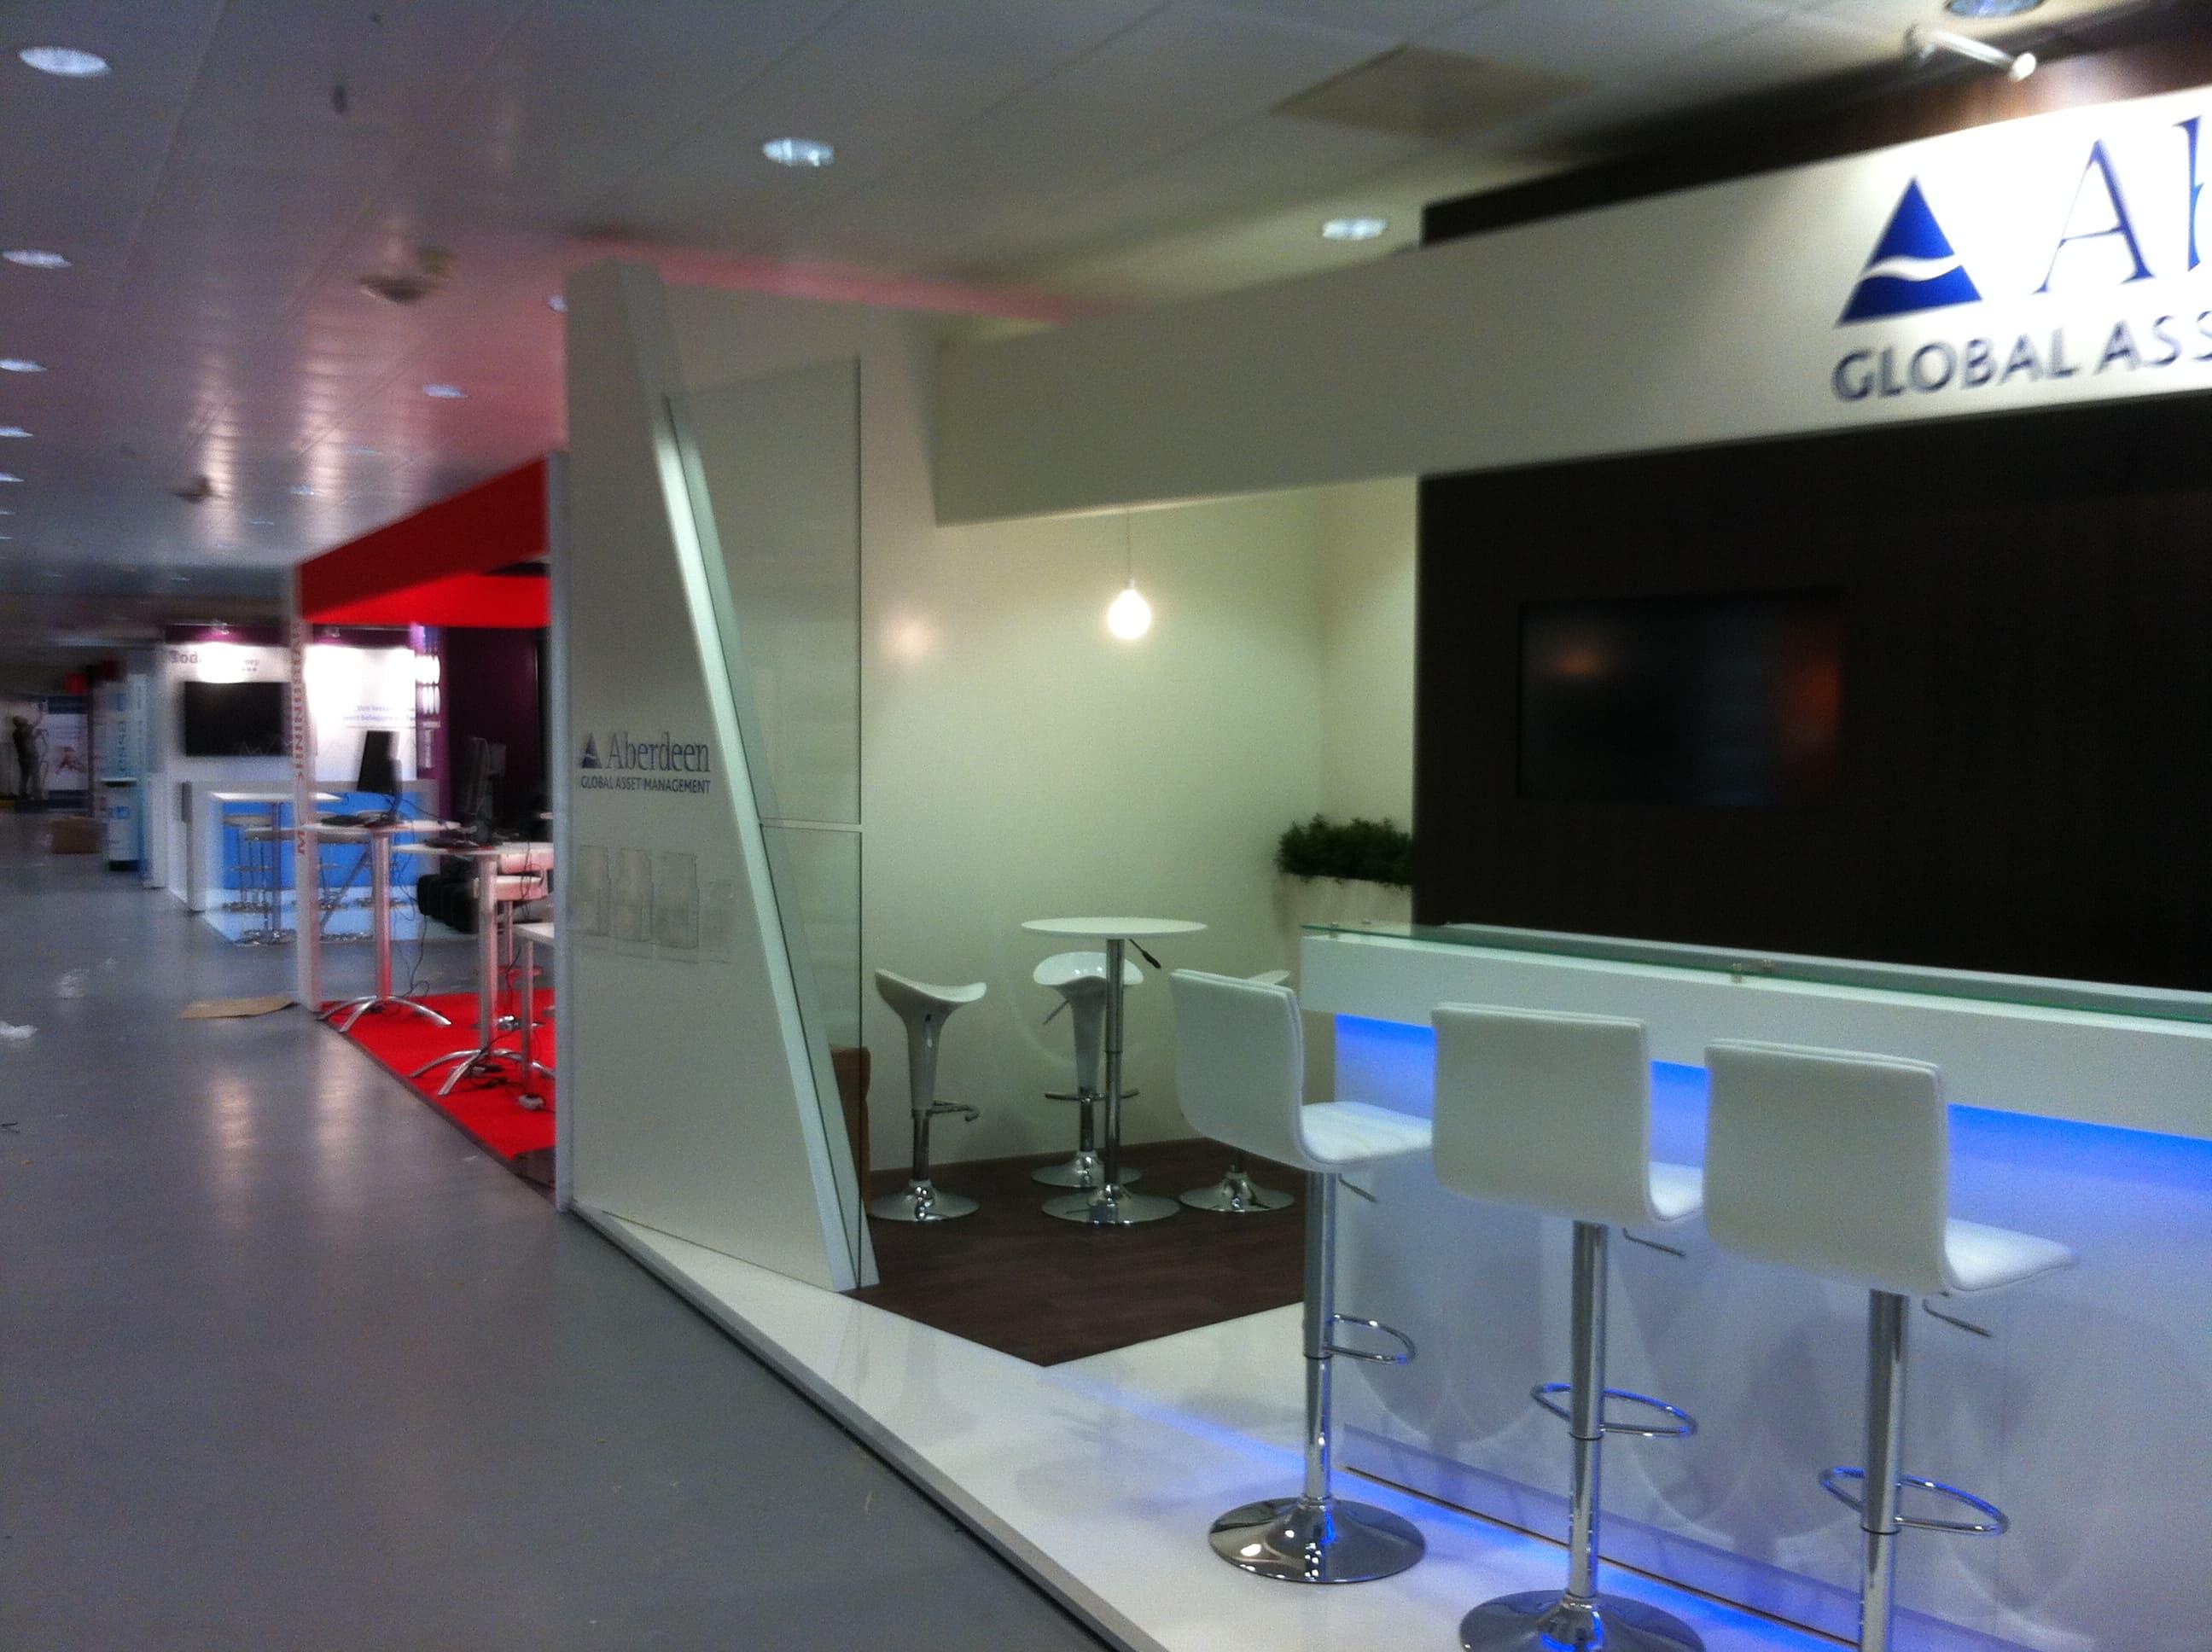 Exhibition Stand Design Amsterdam : Aberdeen global asset management amsterdam display stand